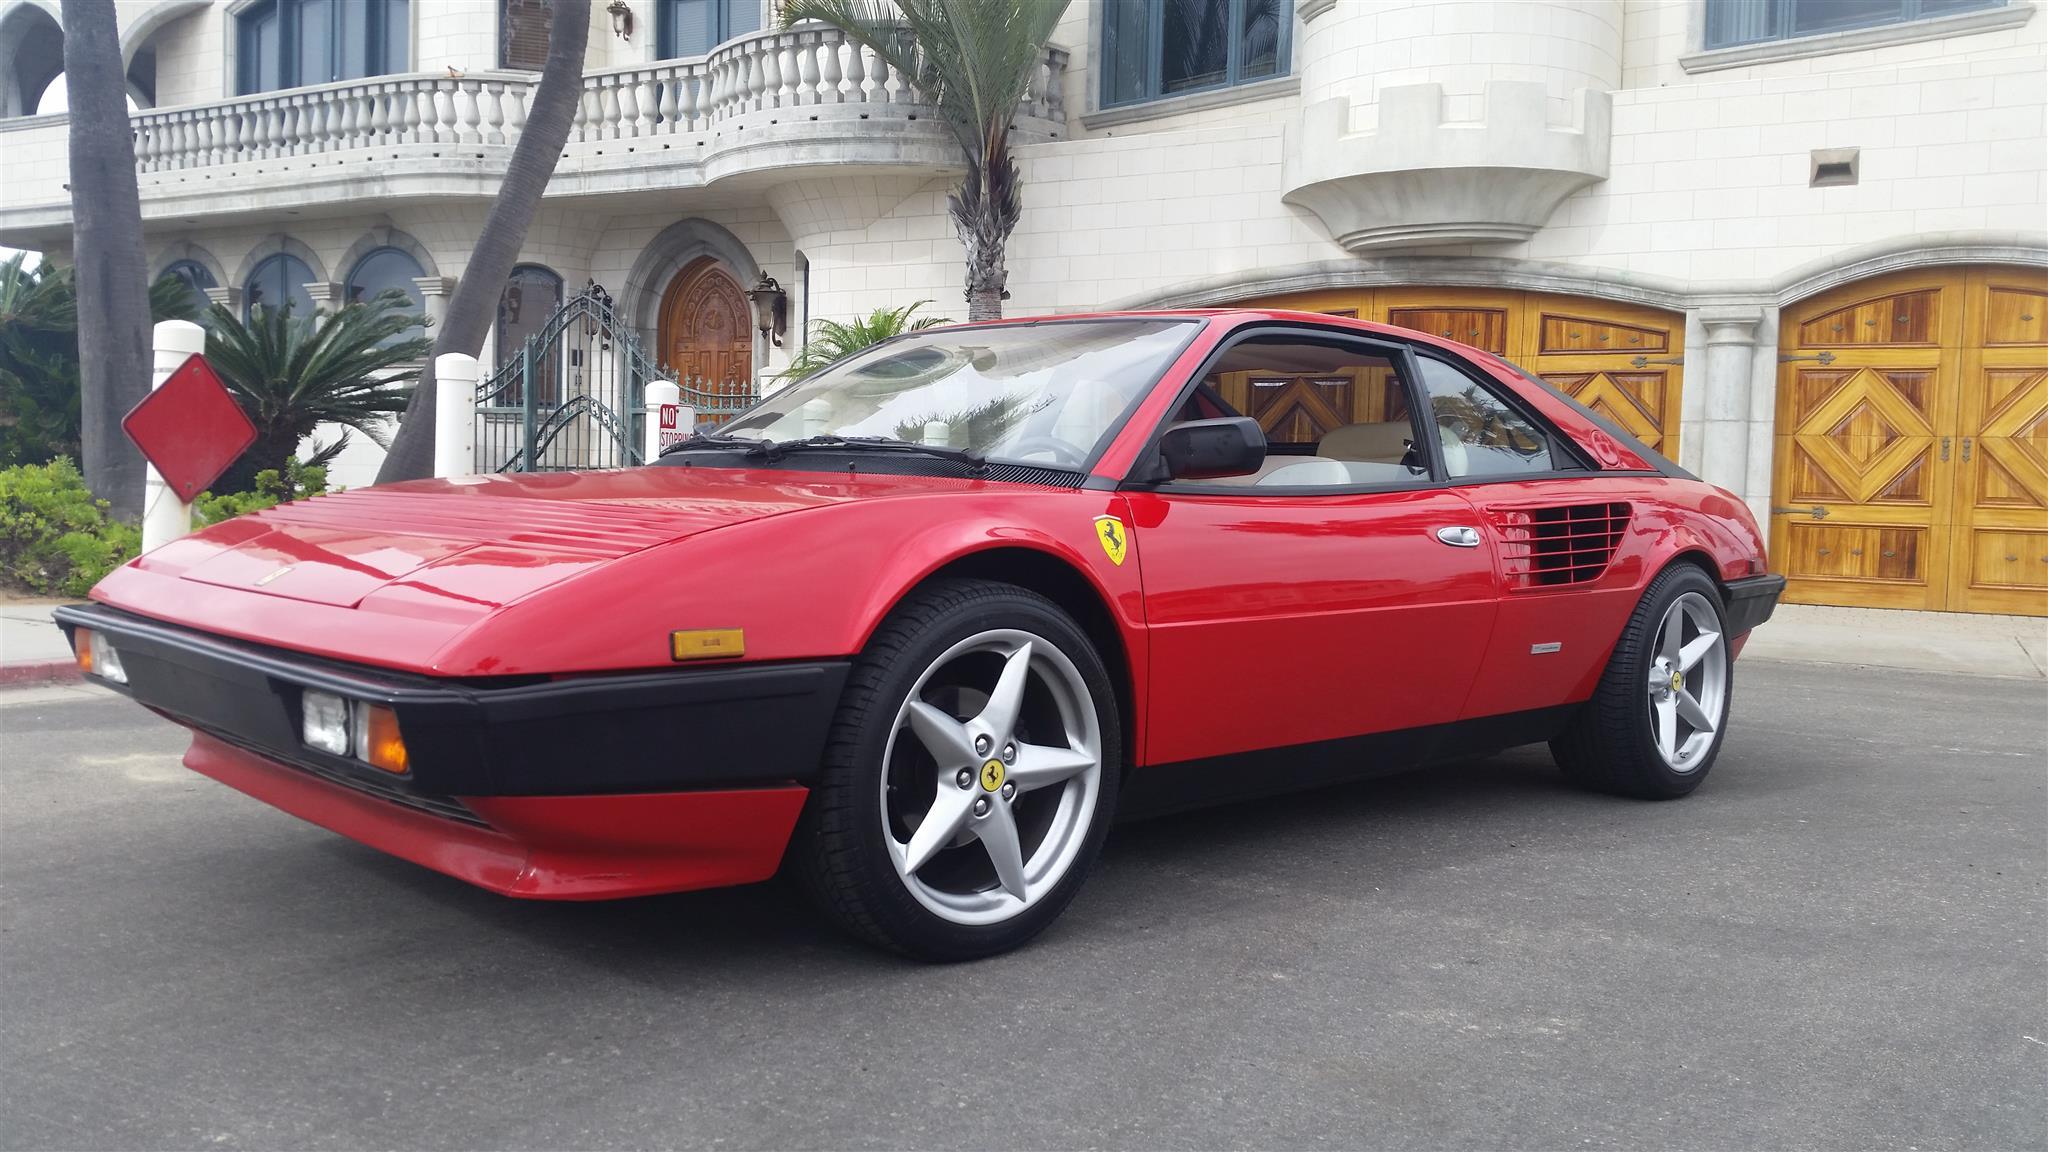 Ferrari - Mondial - 1982